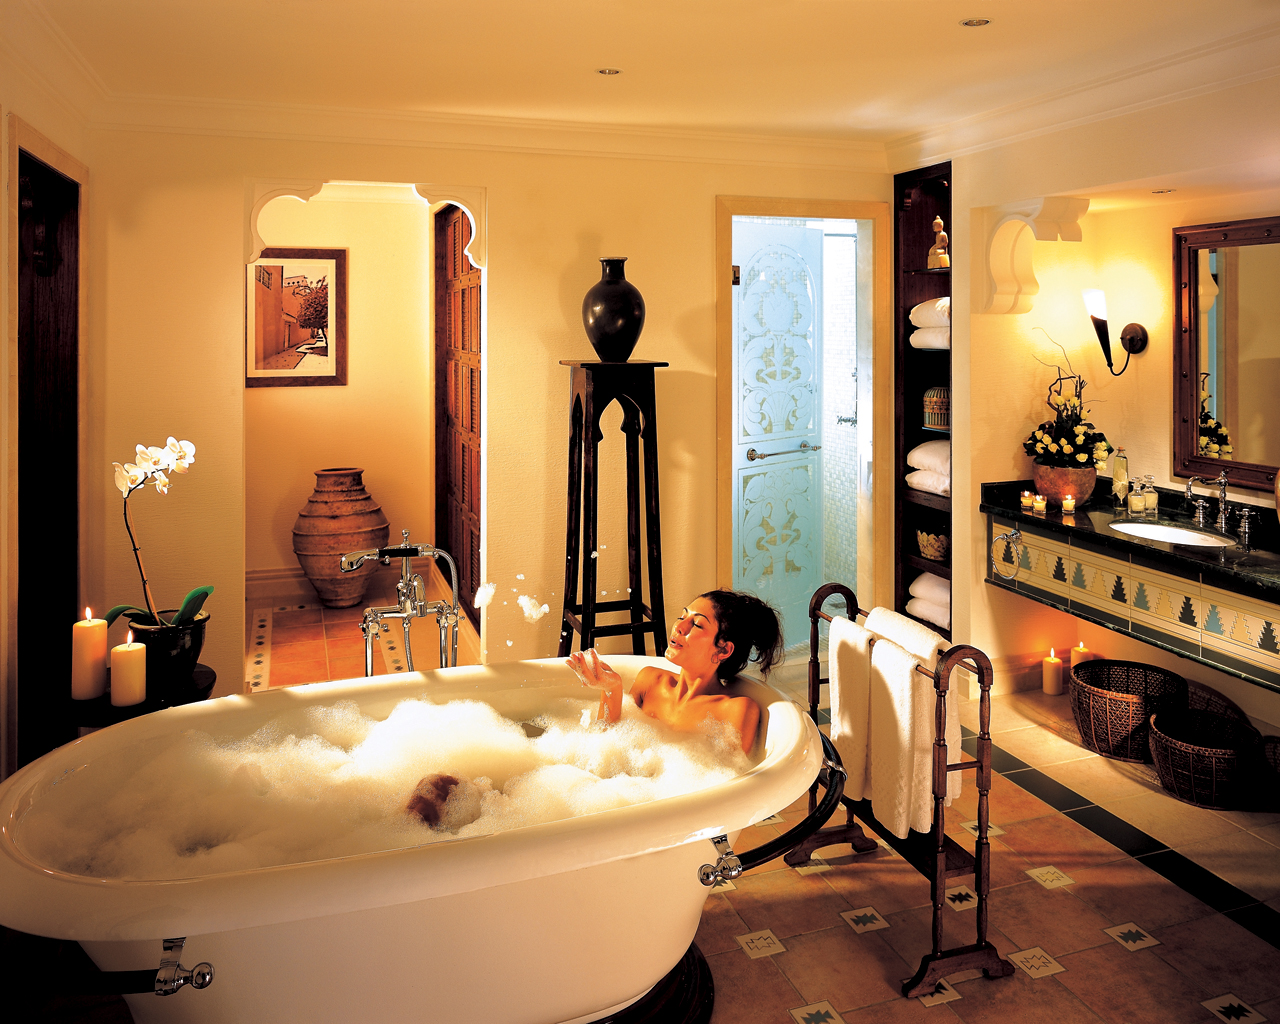 Burj al arab hotel dubai luxury places for Burj al khalifa hotel rooms